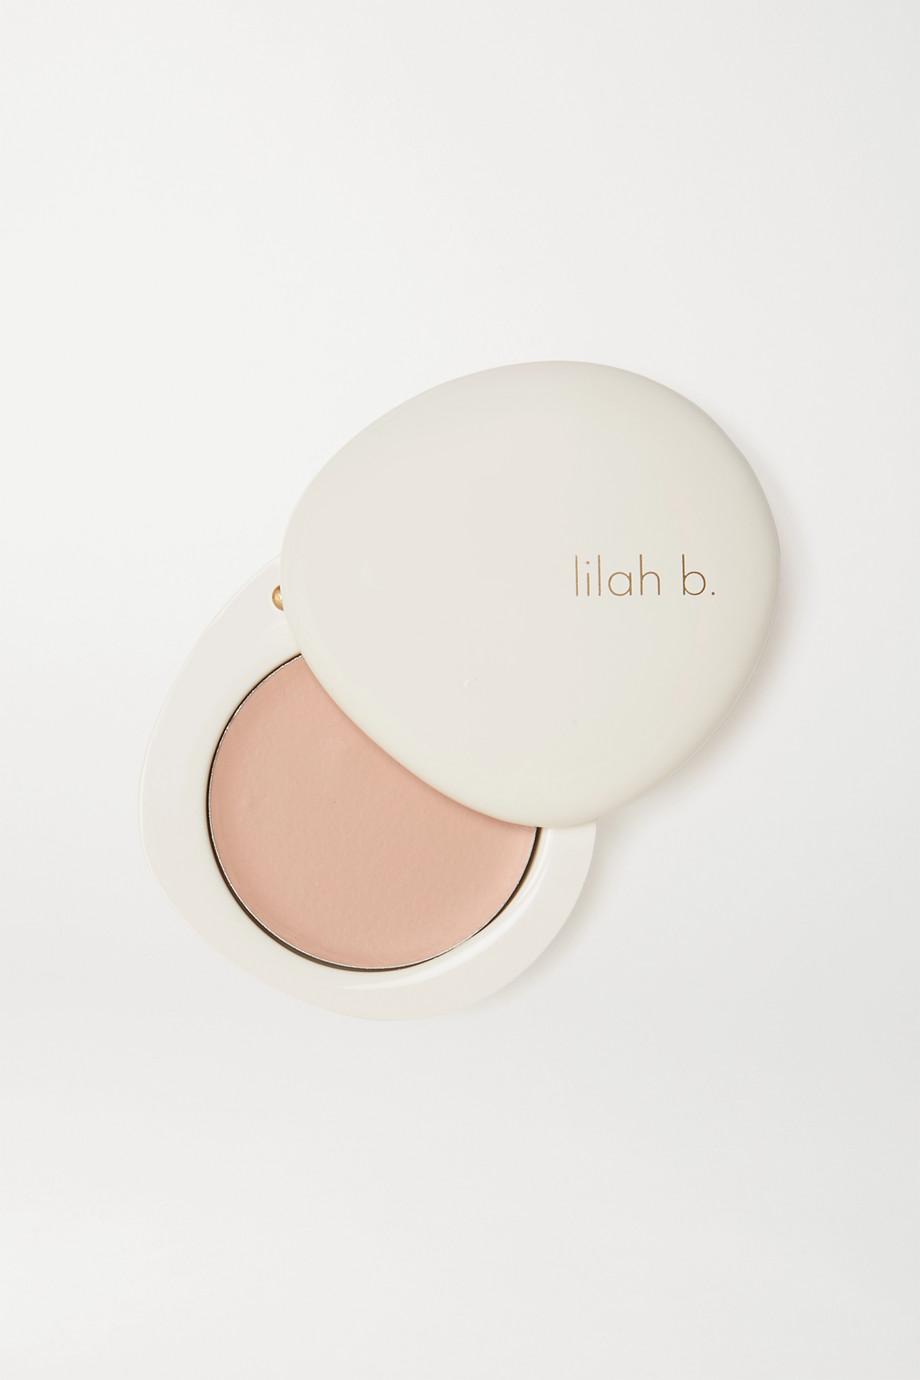 Lilah B. Virtuous Veil Concealer & Eye Primer - b. vibrant